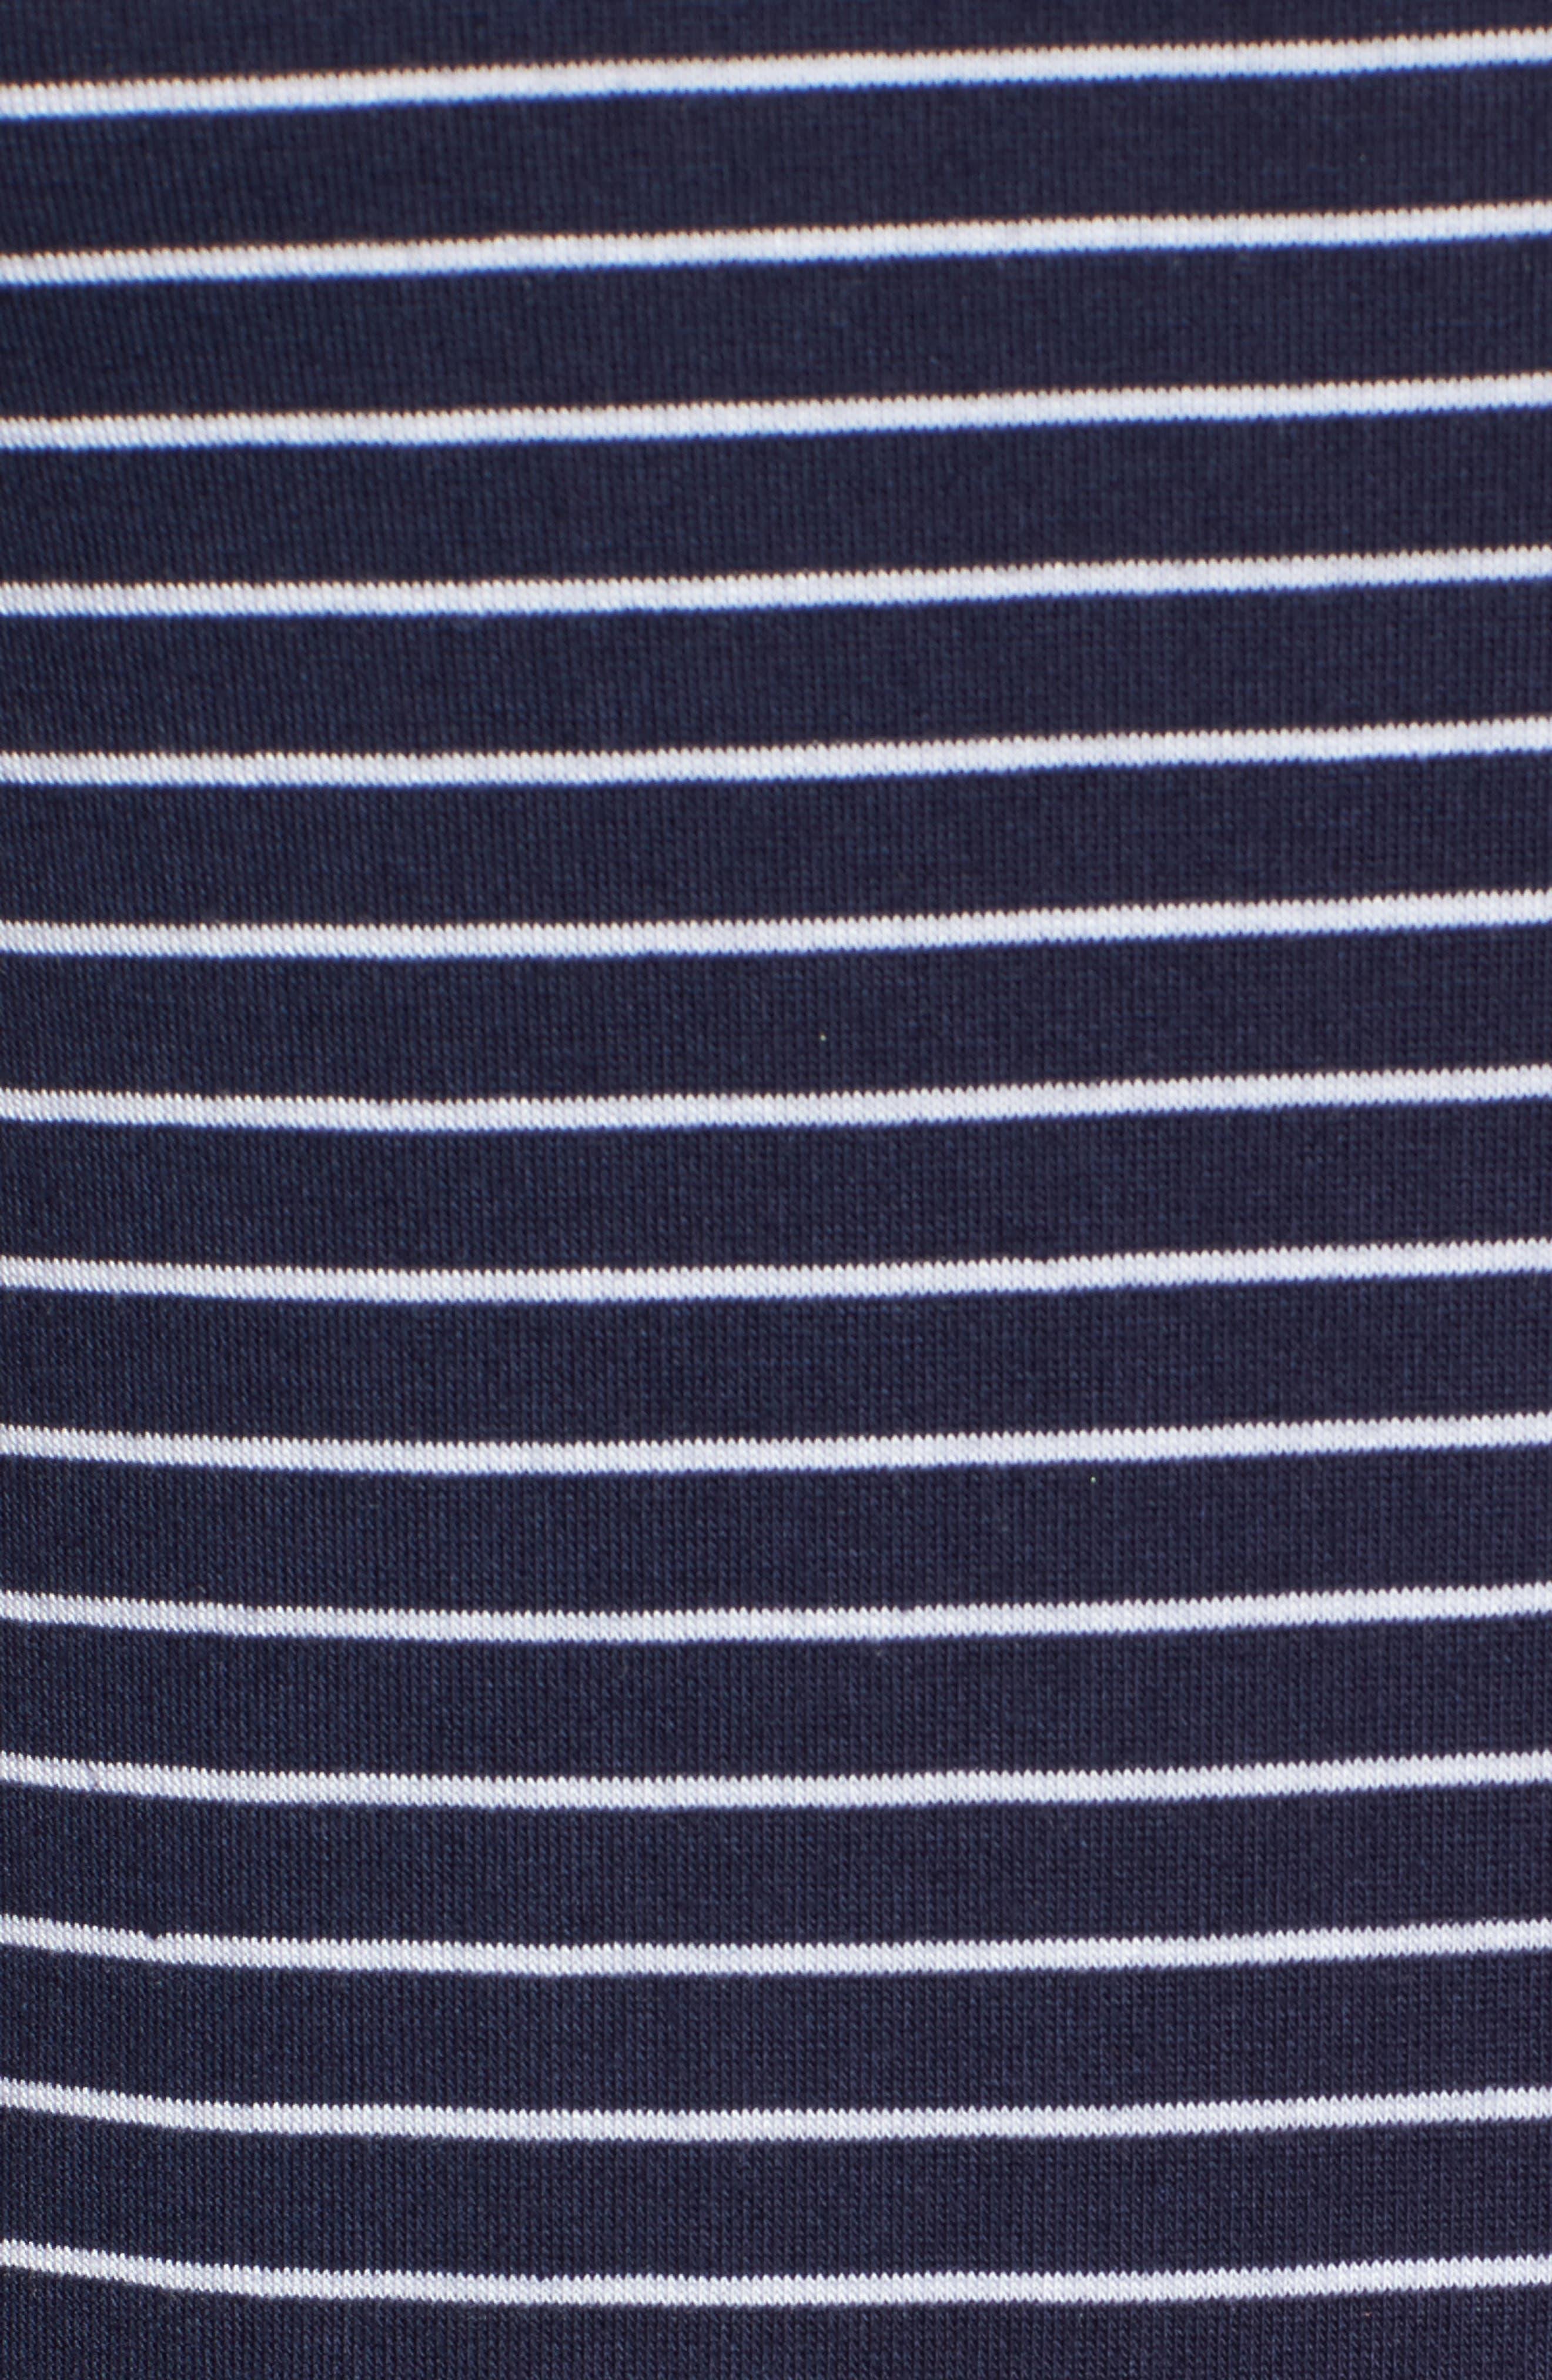 Twist Back Tank Dress,                             Alternate thumbnail 5, color,                             Navy Eclipse Stripe